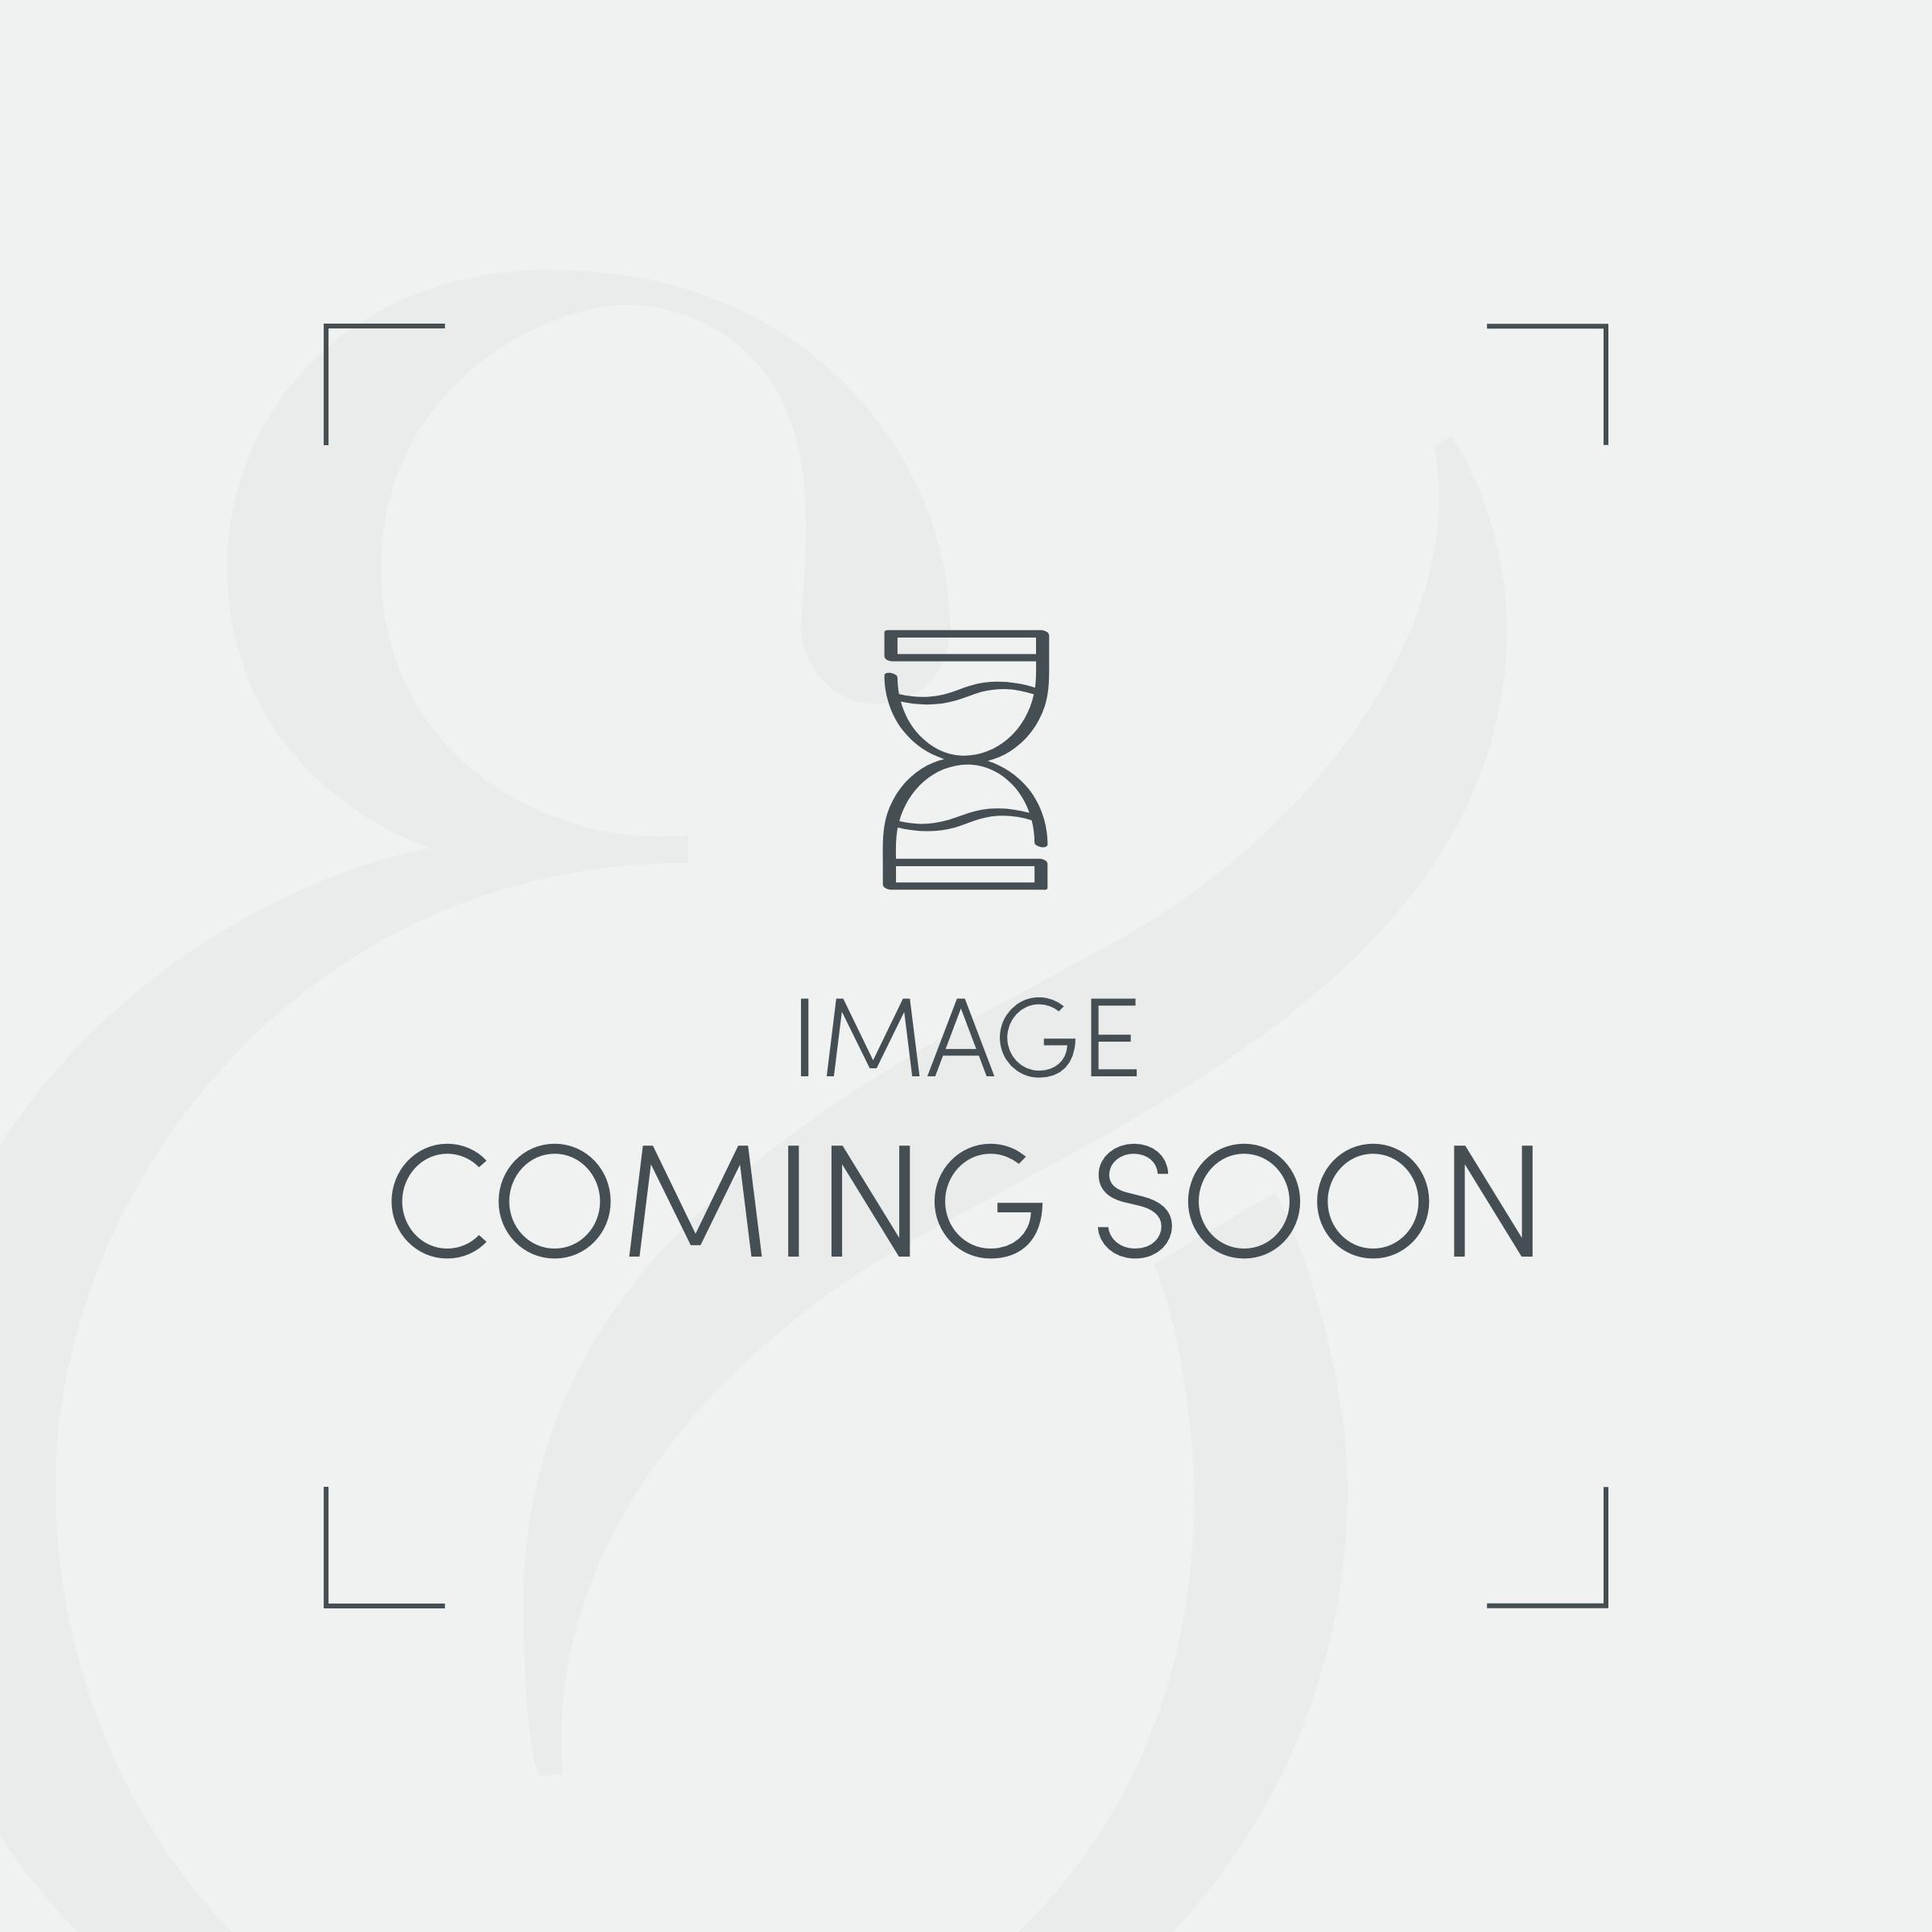 Special Buy 500TC Egyptian Cotton Sateen - Superking Duvet Cover - White